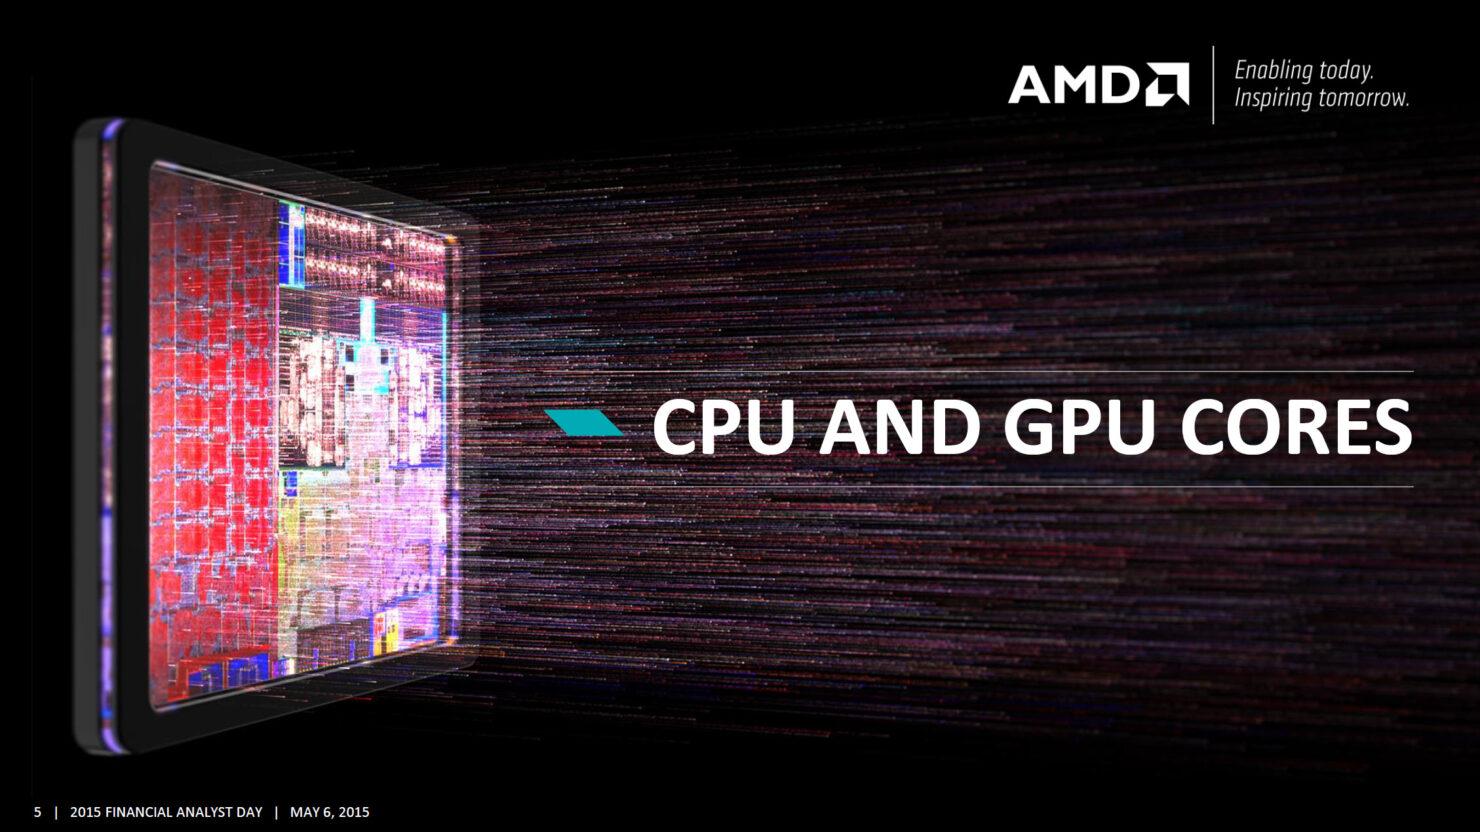 amd-cpu-and-gpu-cores